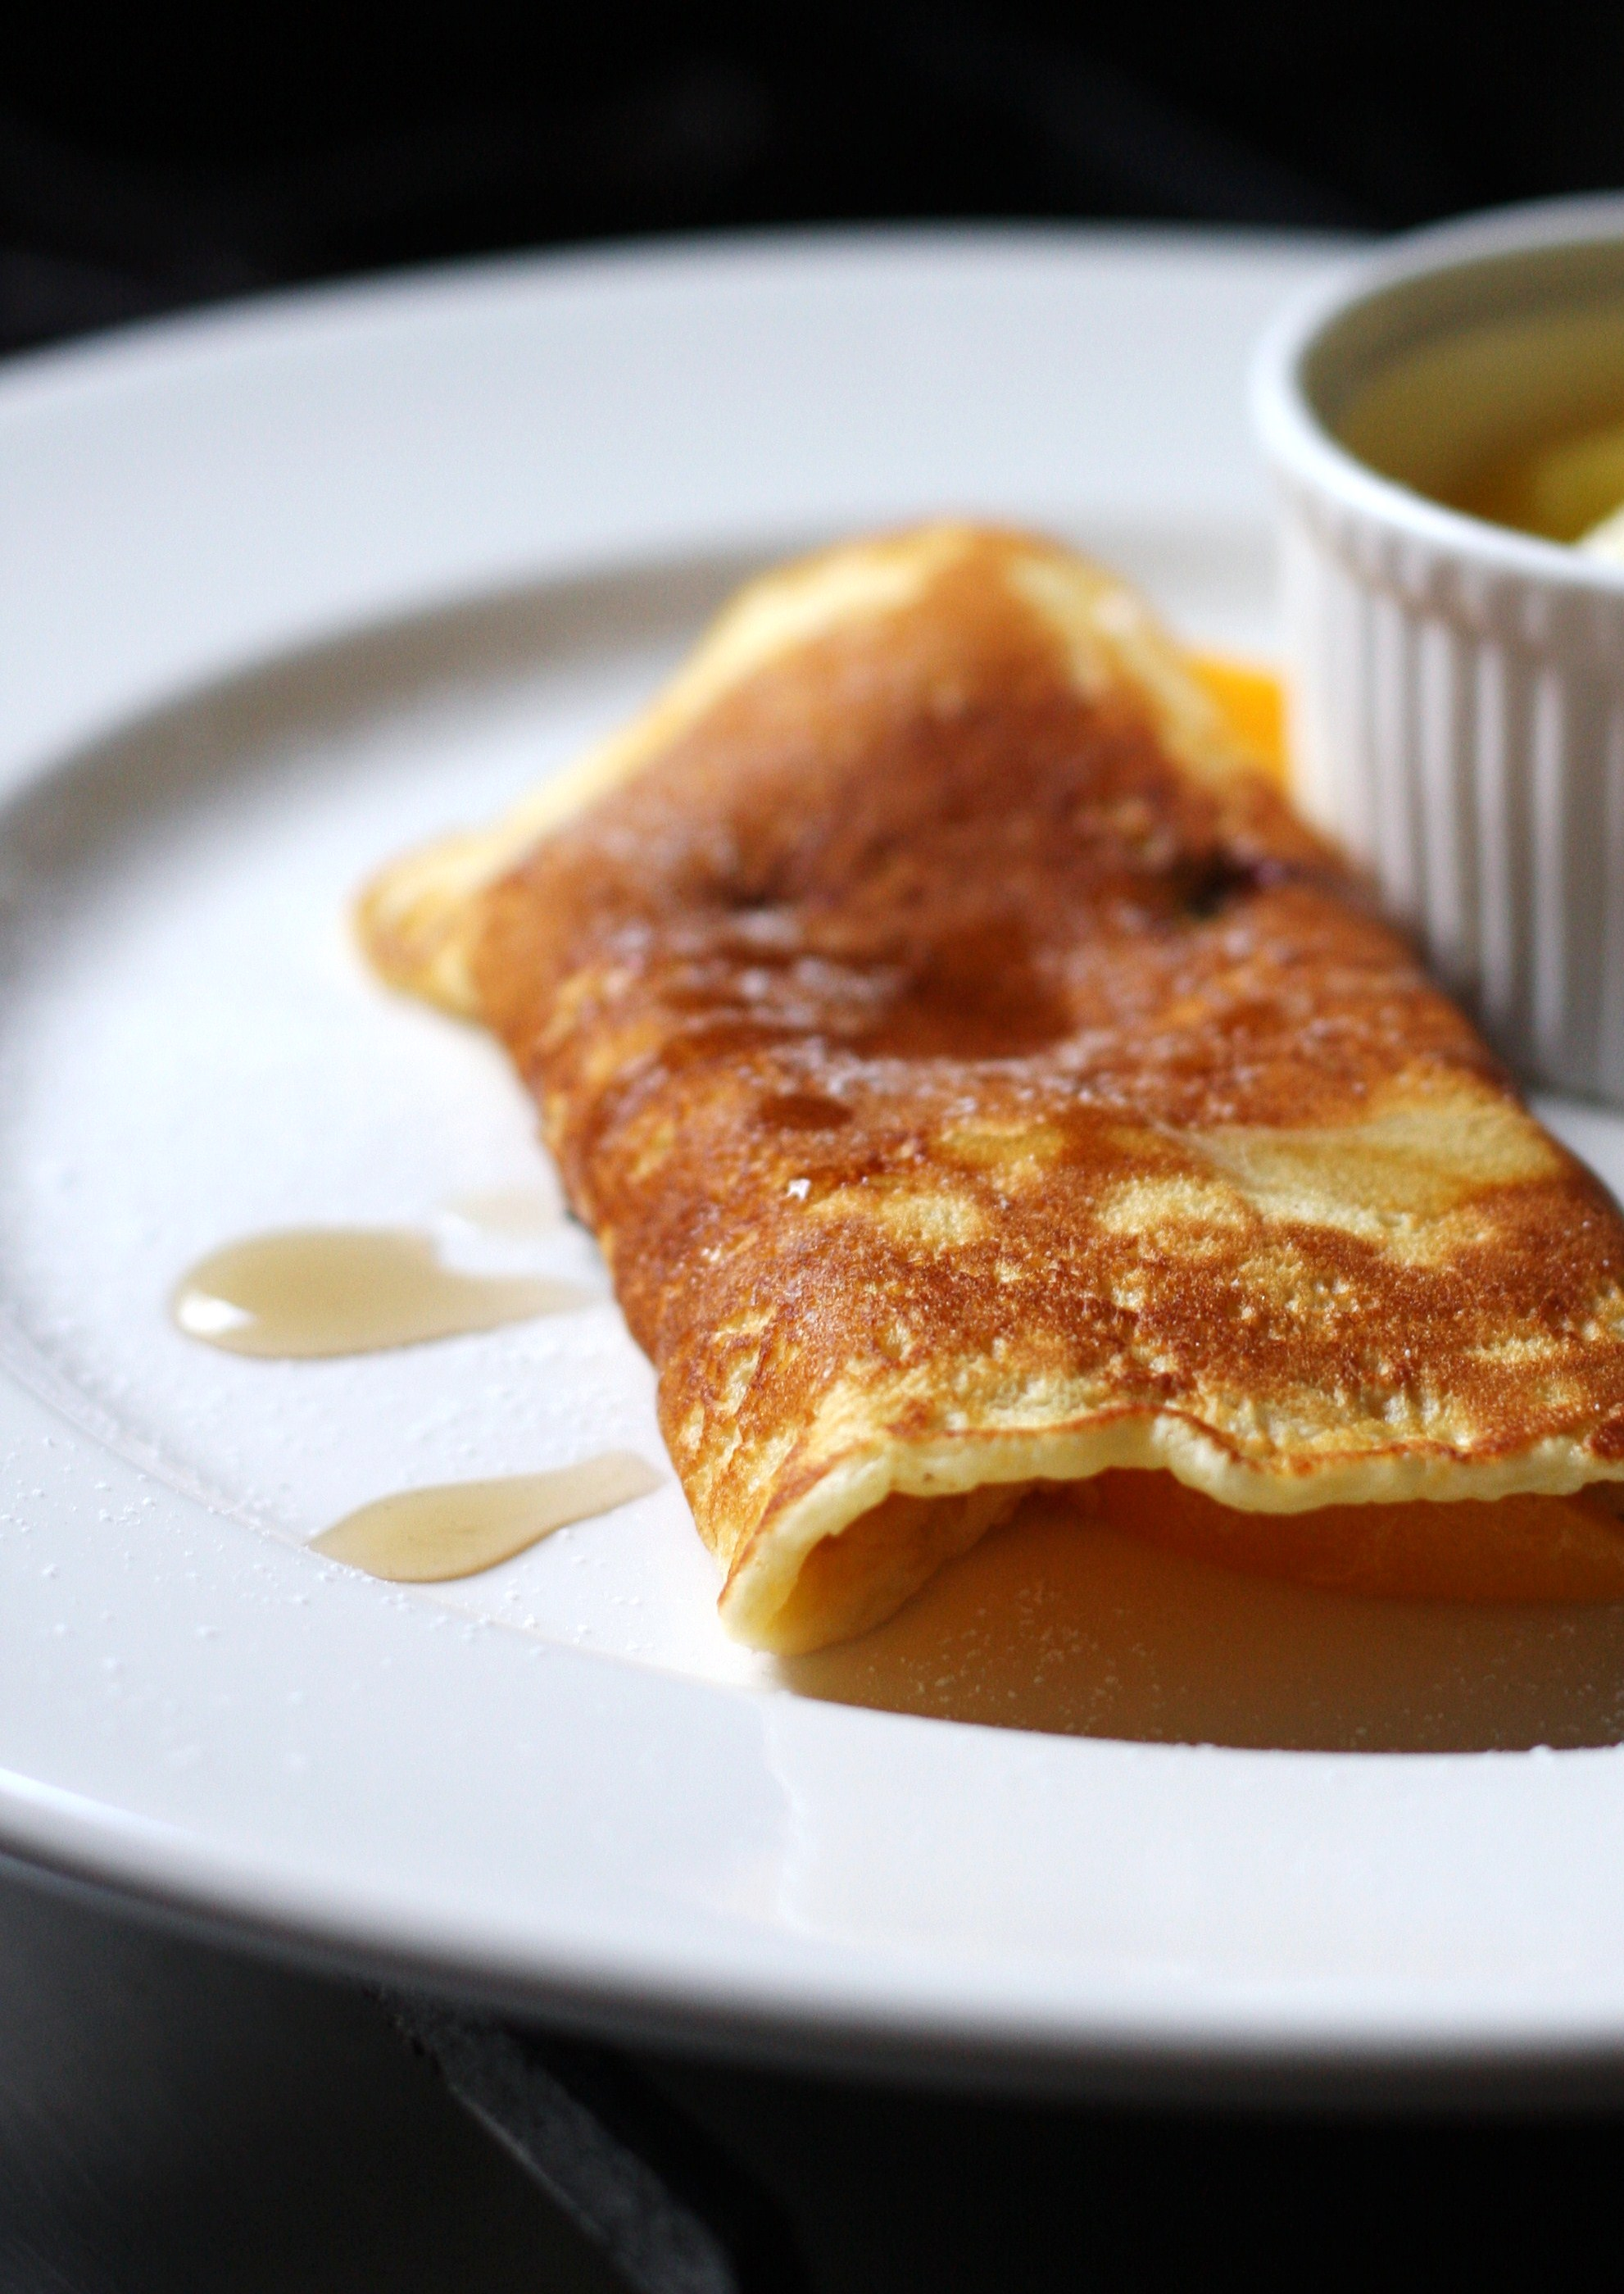 Foldover pancakes carlton grove by abby 2 cups self raising flour ccuart Images